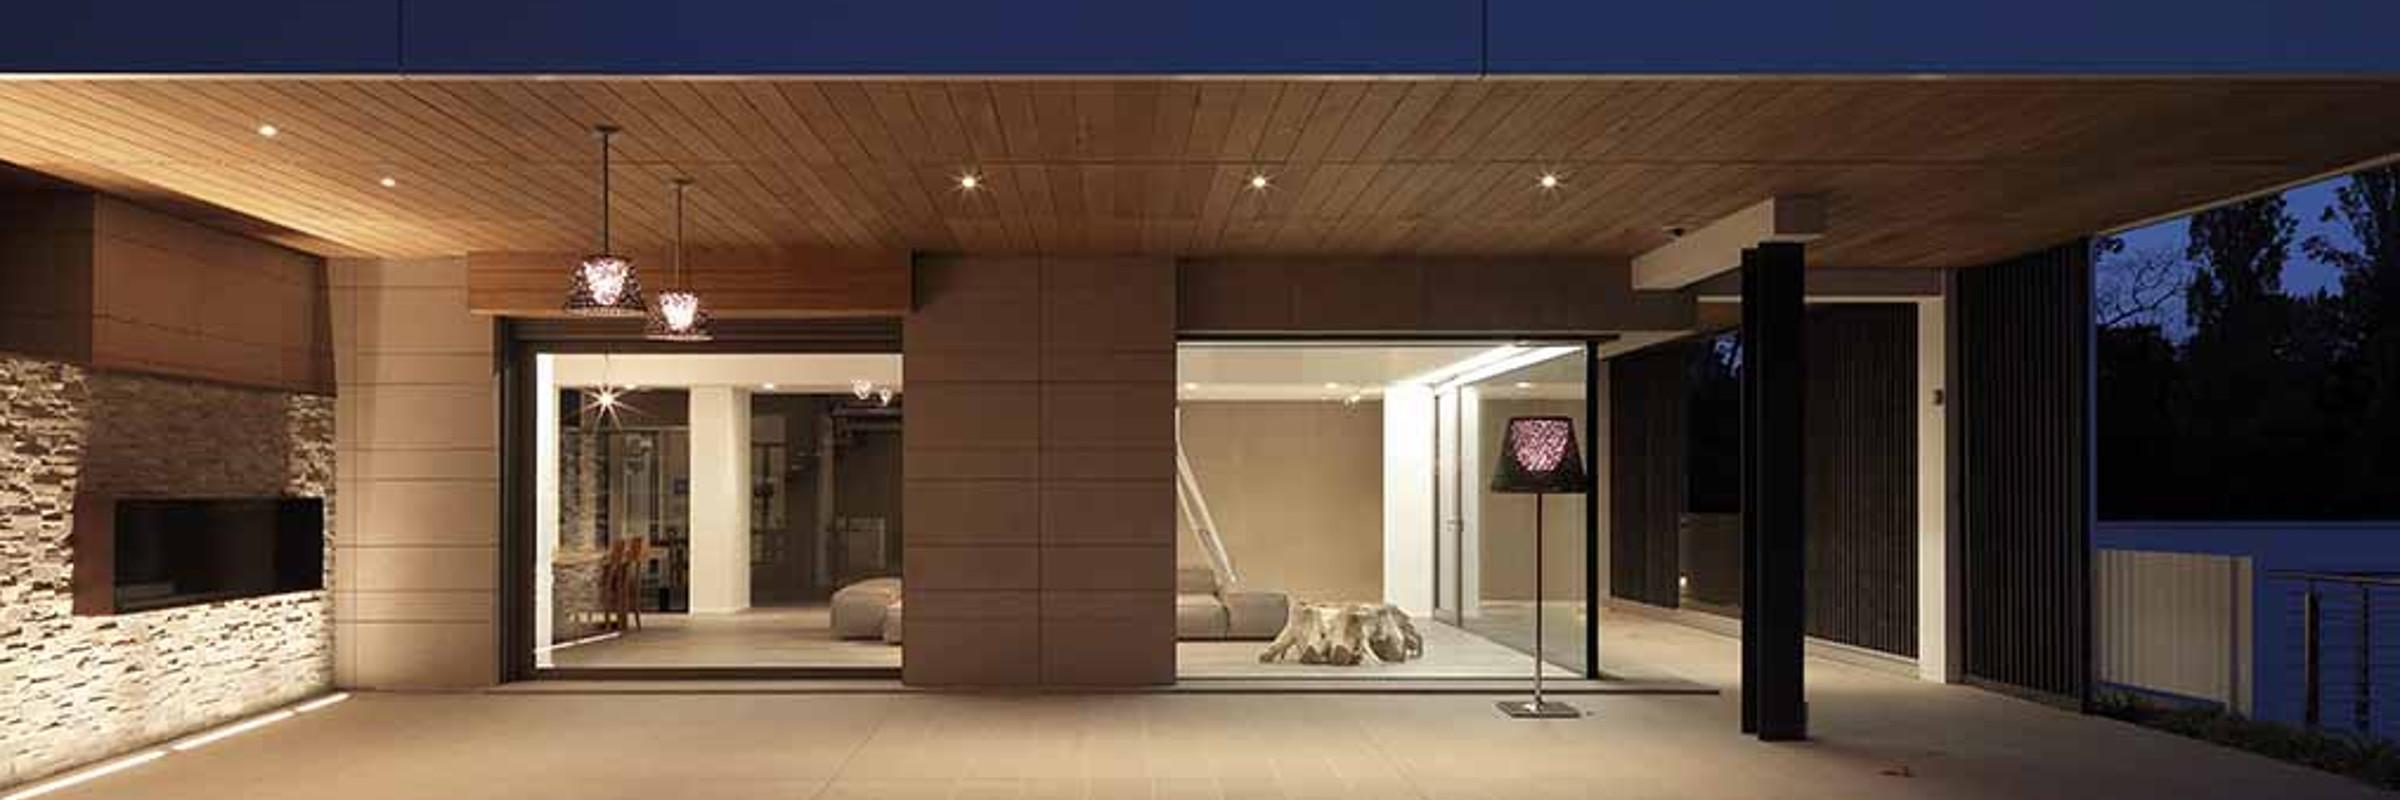 Schüco Italia reinterpreta l'architettura organica_img1